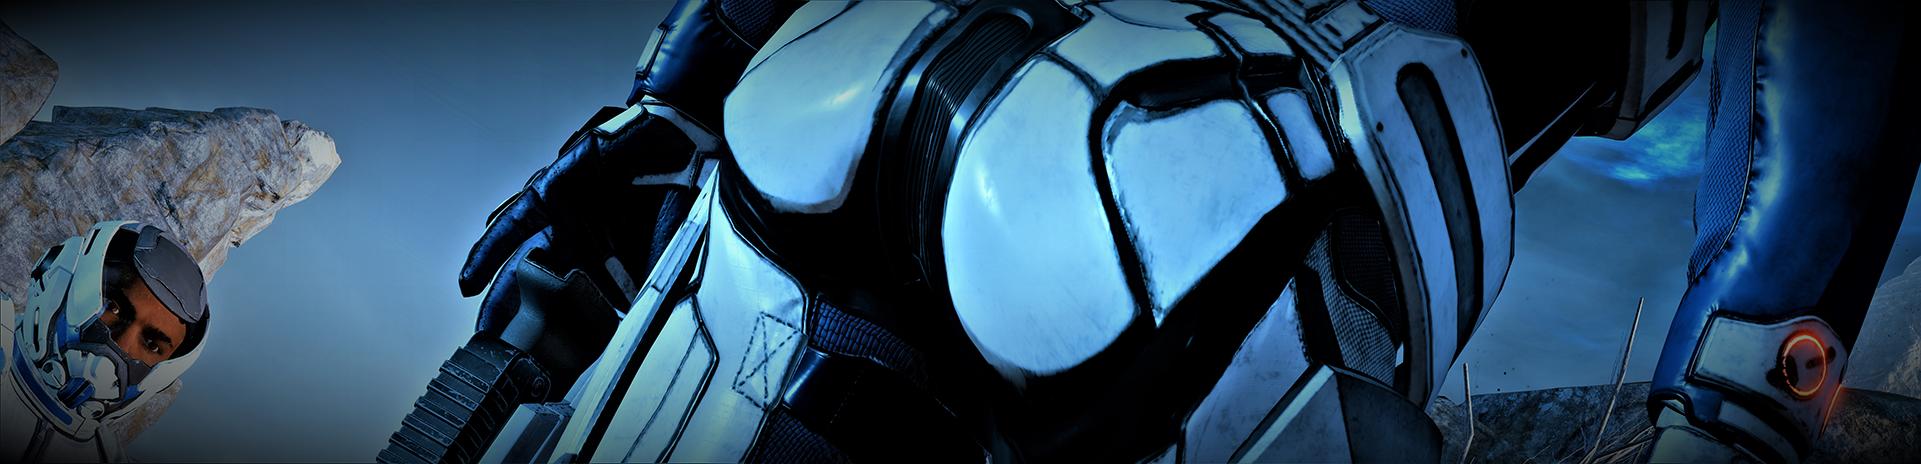 Mass Effect Andromeda Super-Resolution 2017.03.21 - 21.51.06.38.png